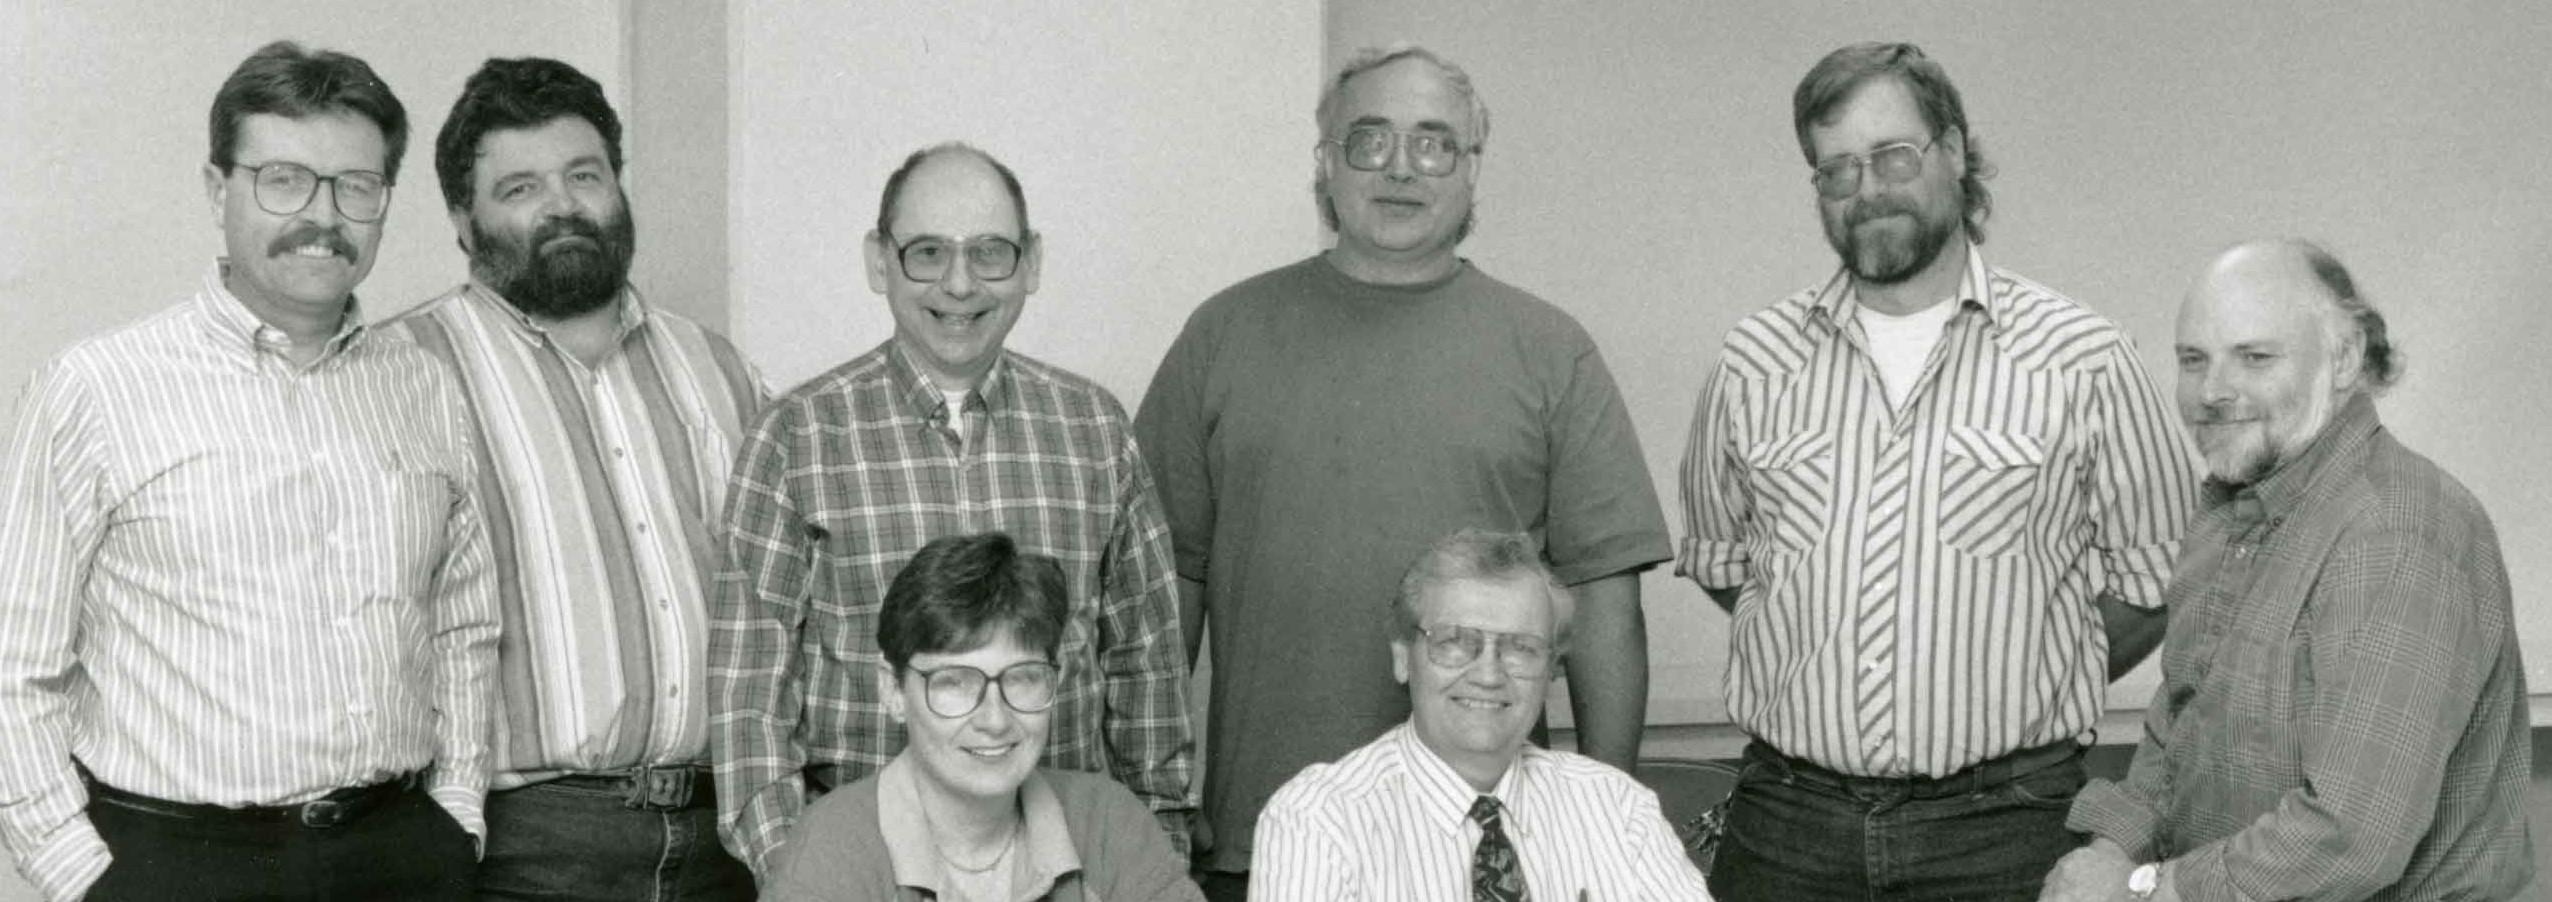 1994-STAFF-SMALL